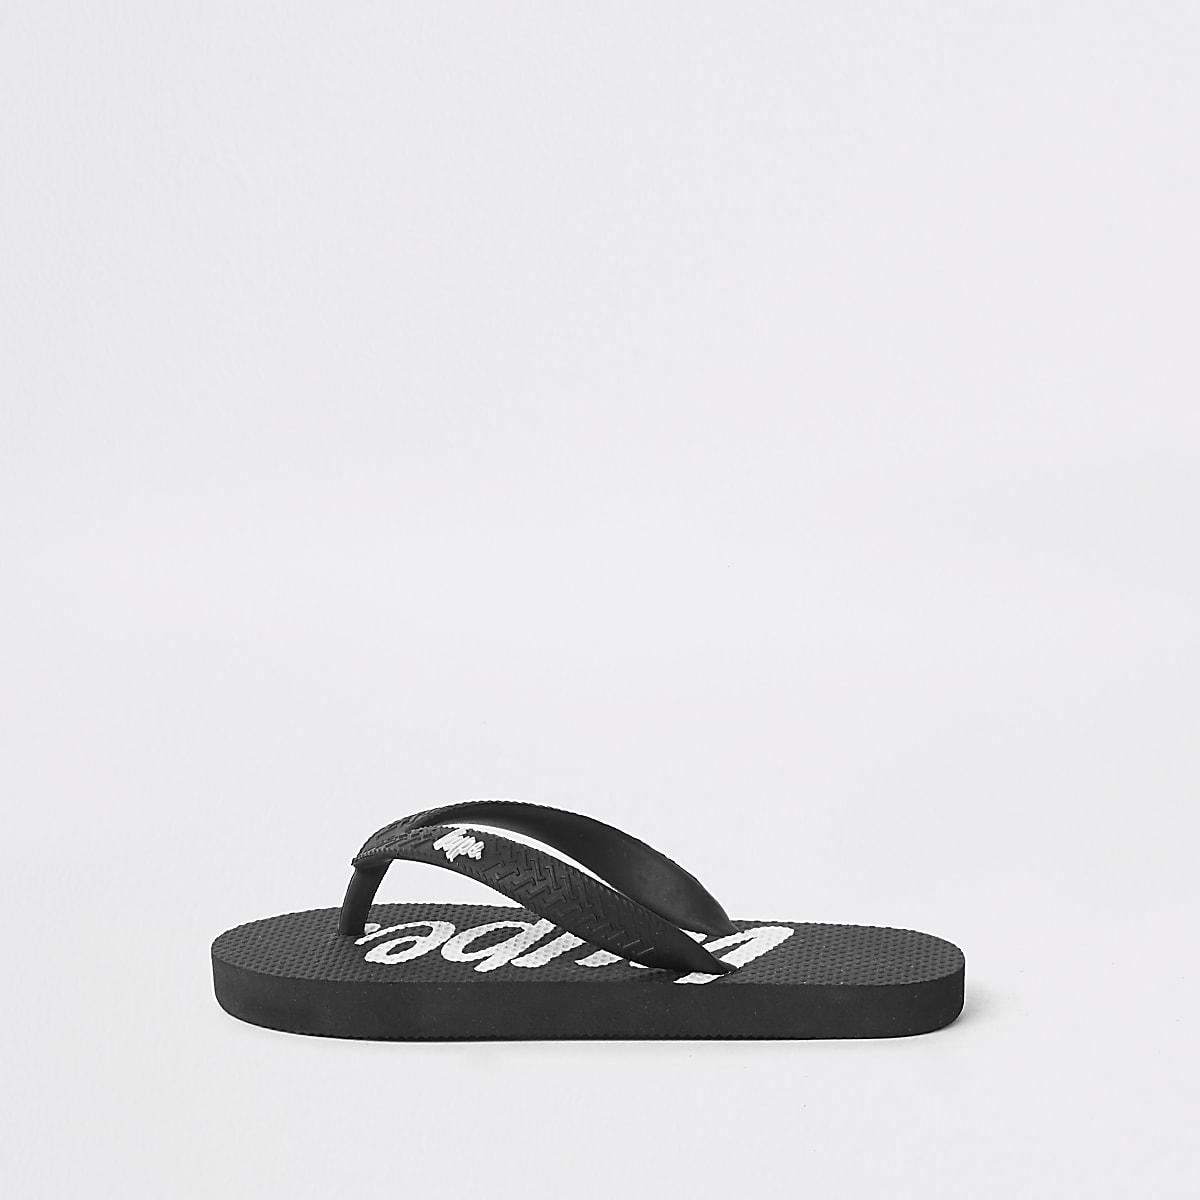 Kids Hype black flip flops